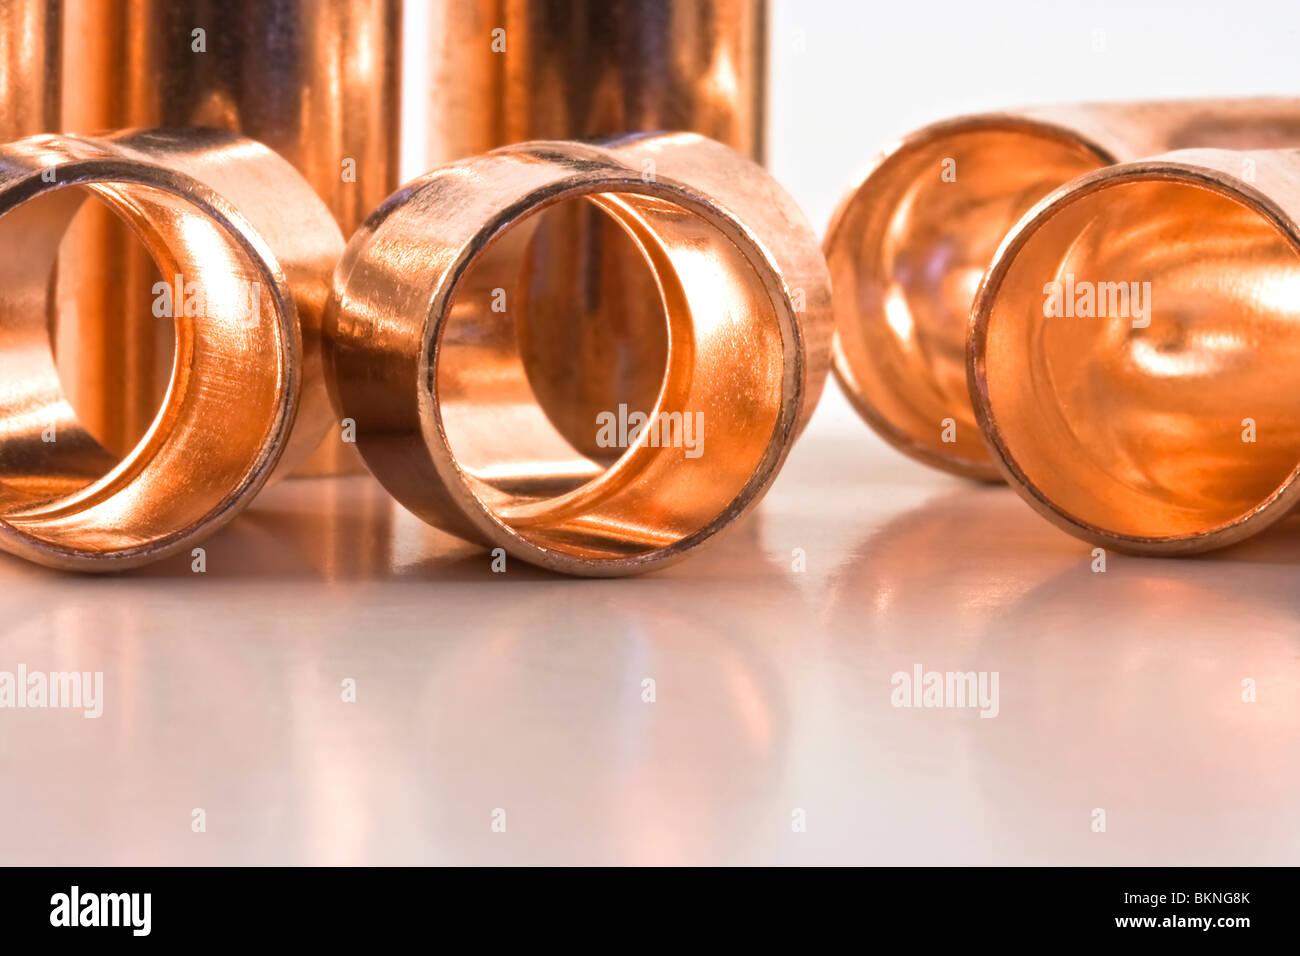 Half inch copper sweat fittings - Stock Image